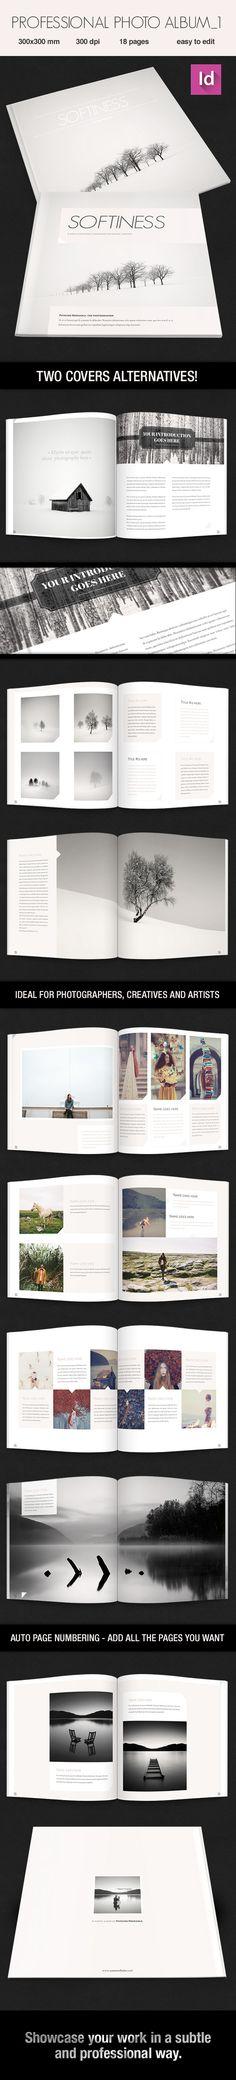 Professional Photo album_1 on Behance